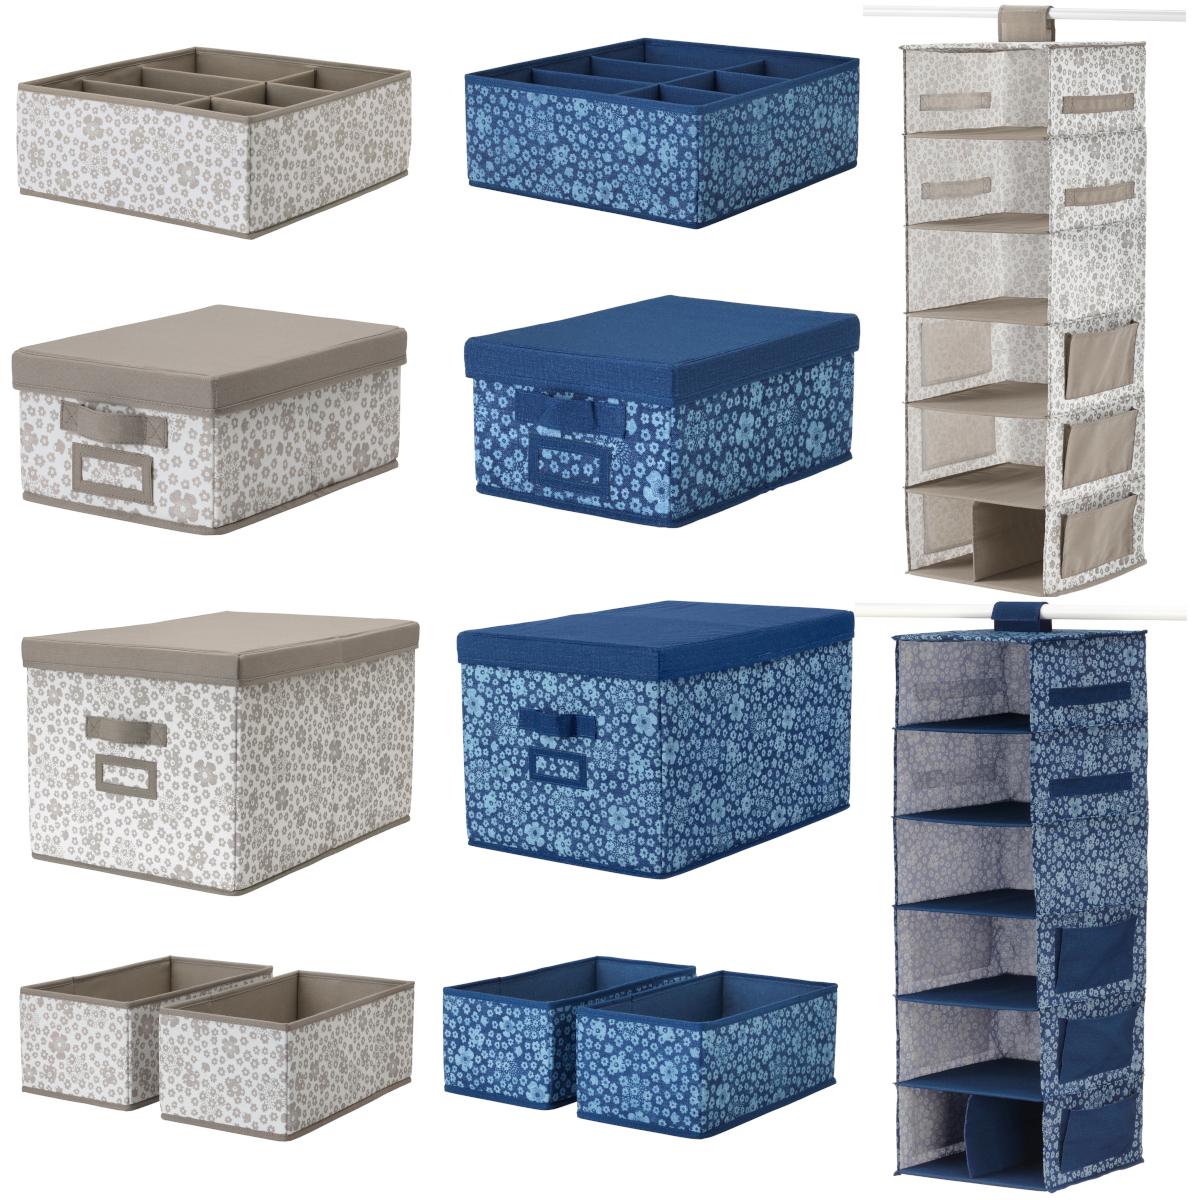 Full Size of Ikea Storstabbe Box Hängeregal Küche Kaufen Modulküche Miniküche Betten Bei Sofa Mit Schlaffunktion 160x200 Kosten Wohnzimmer Ikea Hängeregal